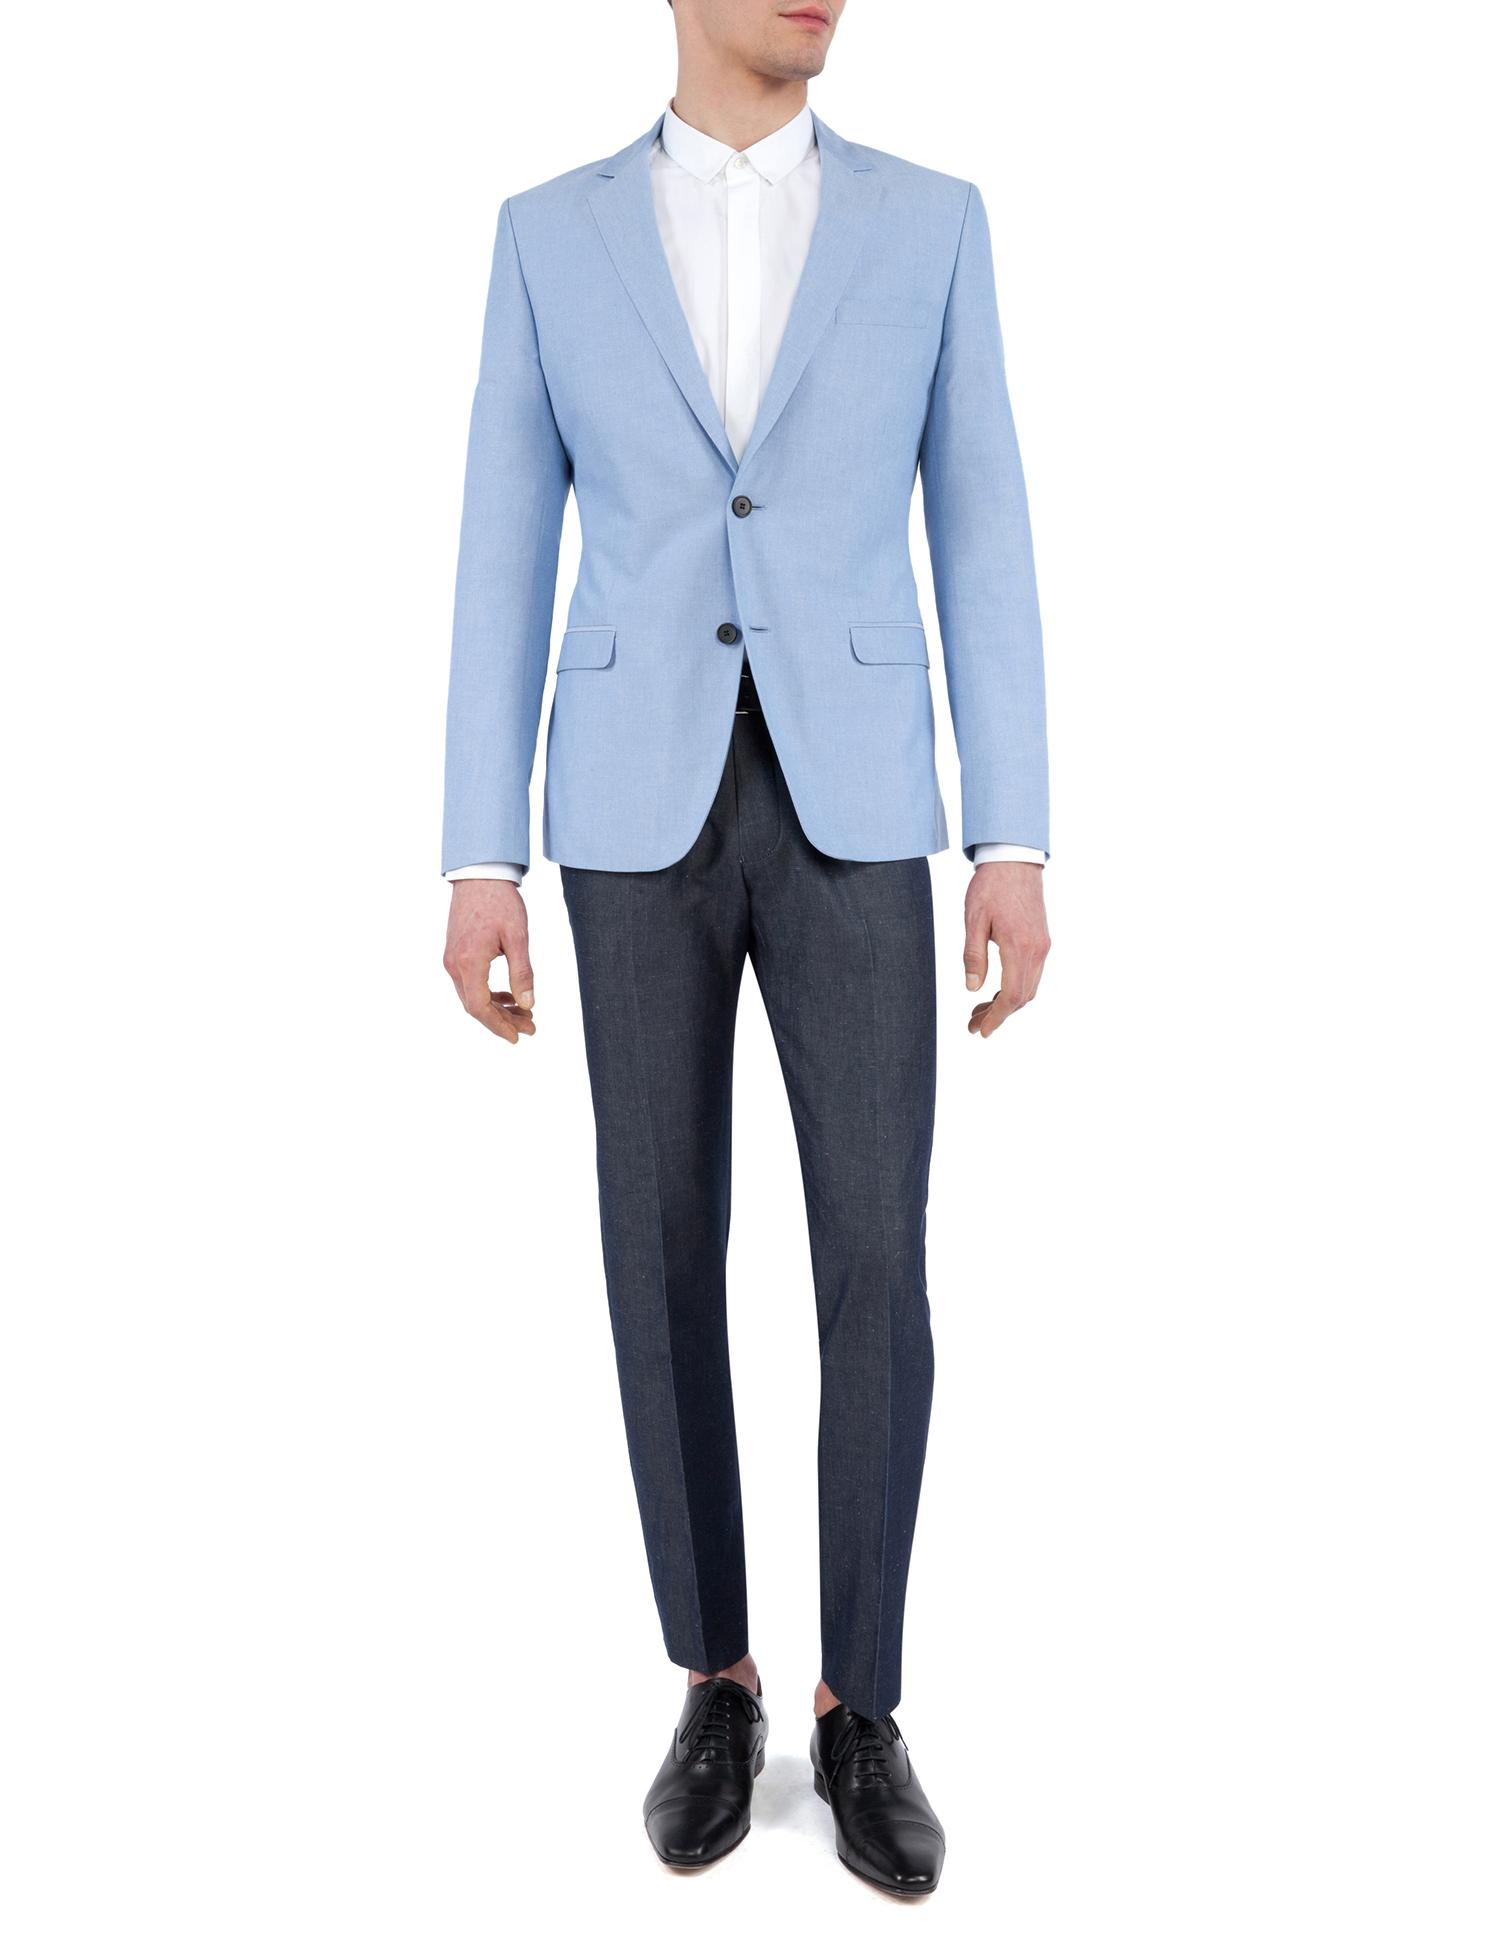 Costume homme bleu ciel pr t porter f minin et masculin - Costume homme pret a porter ...